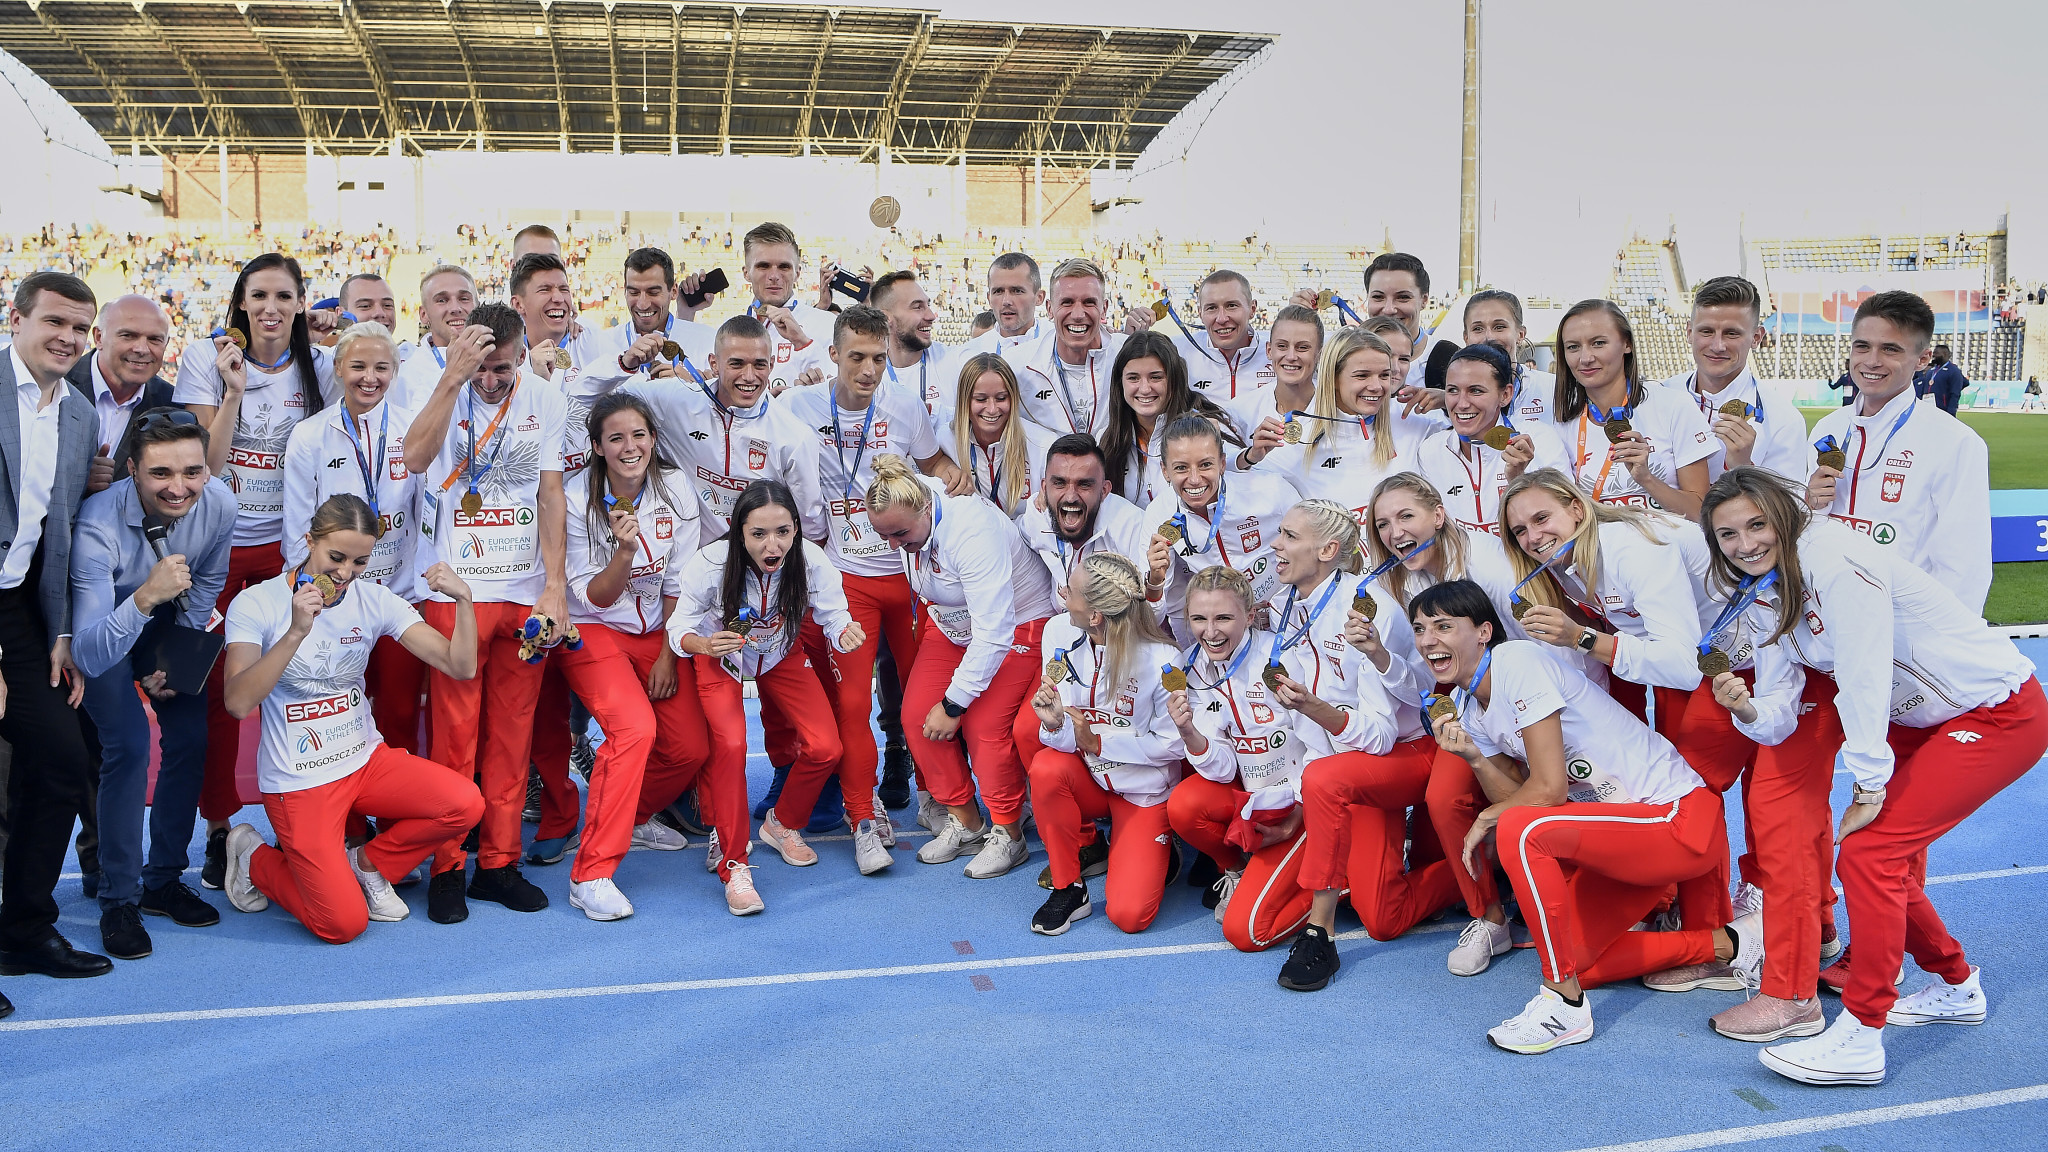 Poland storm to European Team Athletics Championship glory in Bydgoszcz